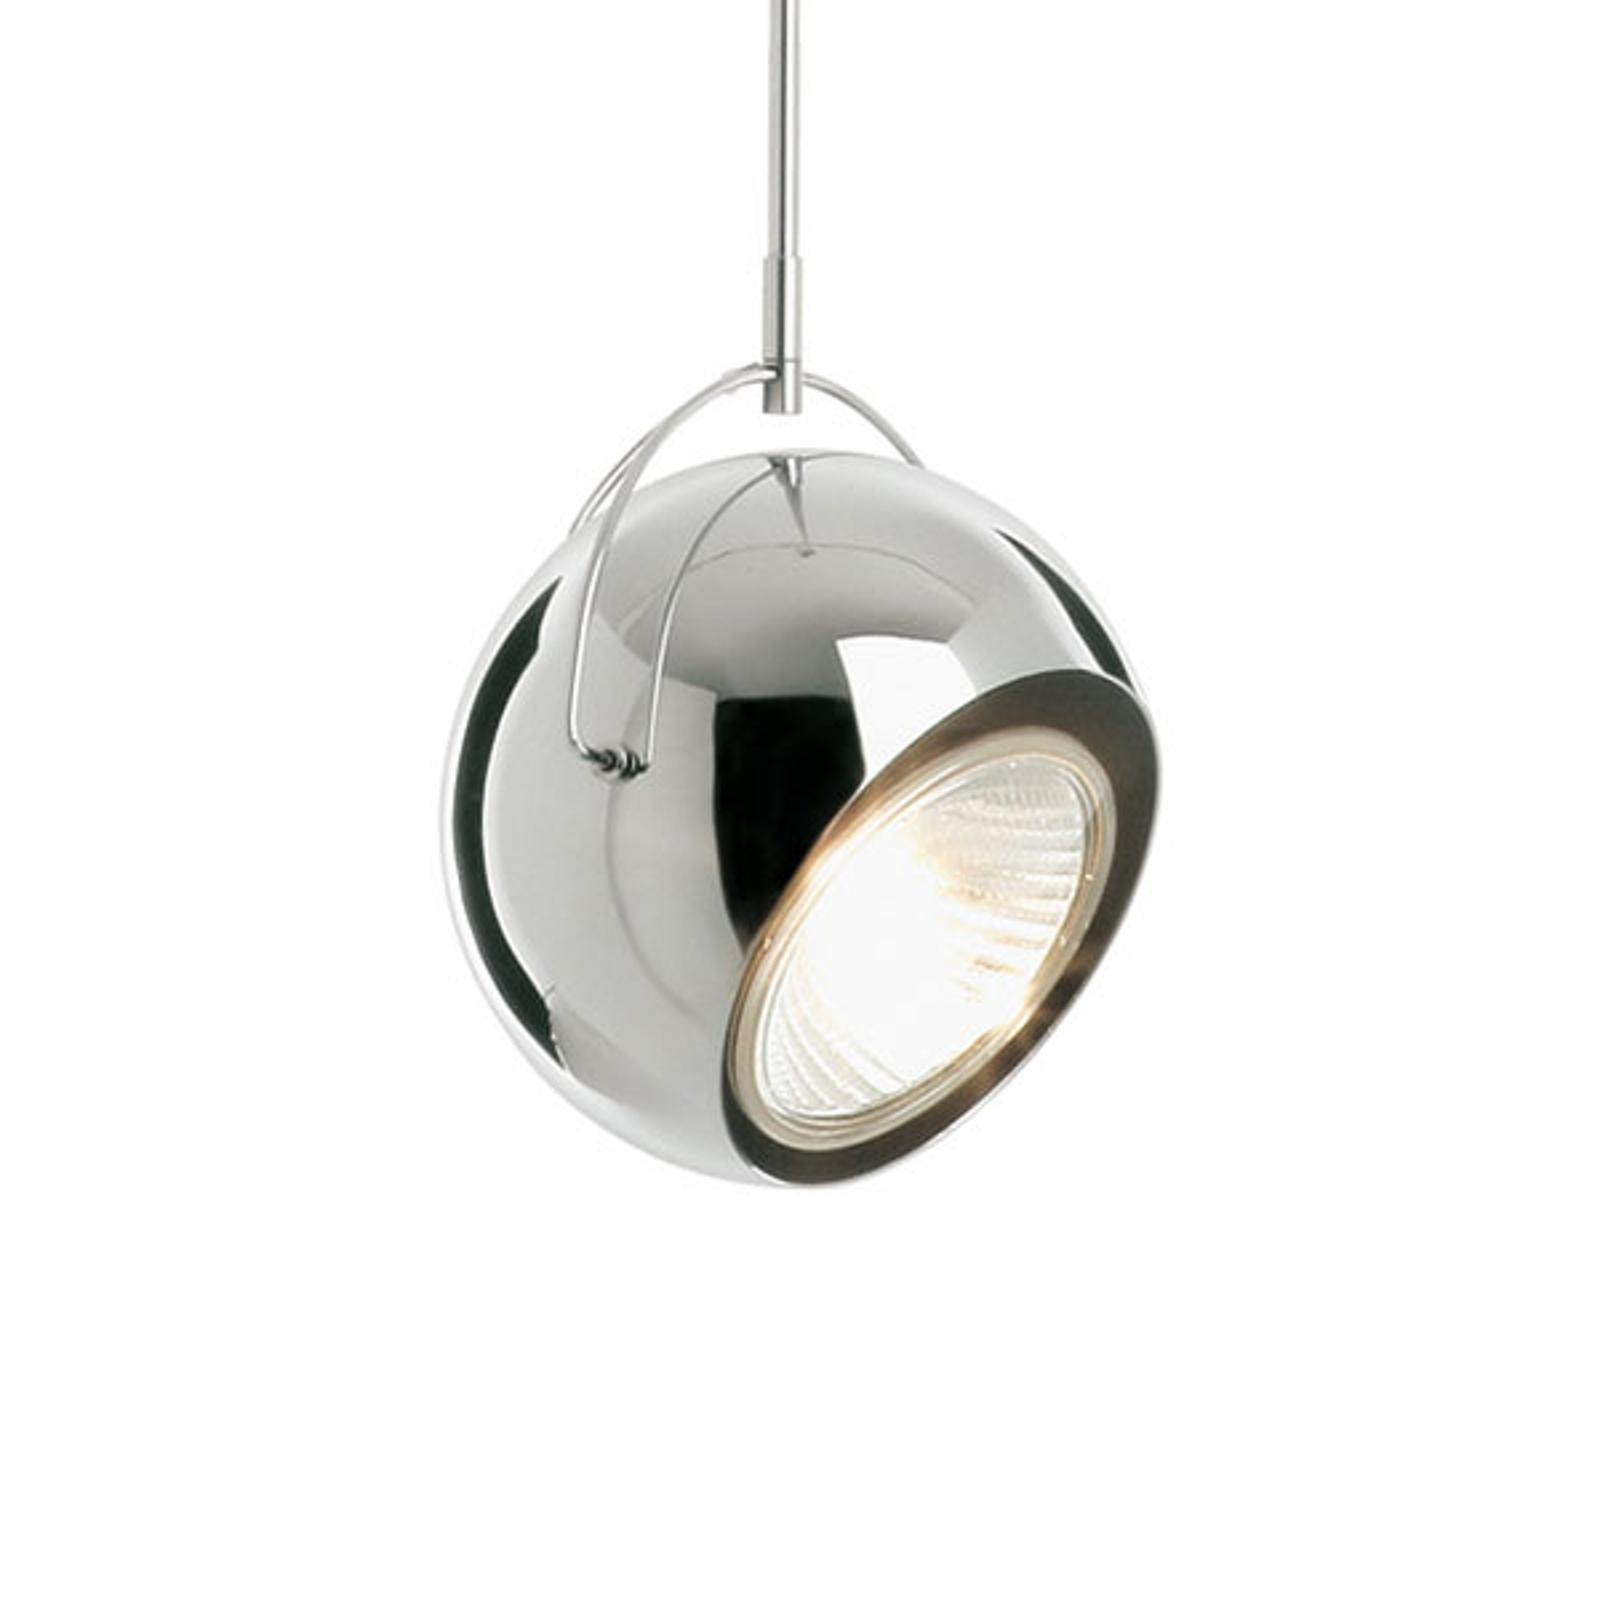 Fabbian Beluga Steel Chrom hængelampe, Ø 14 cm